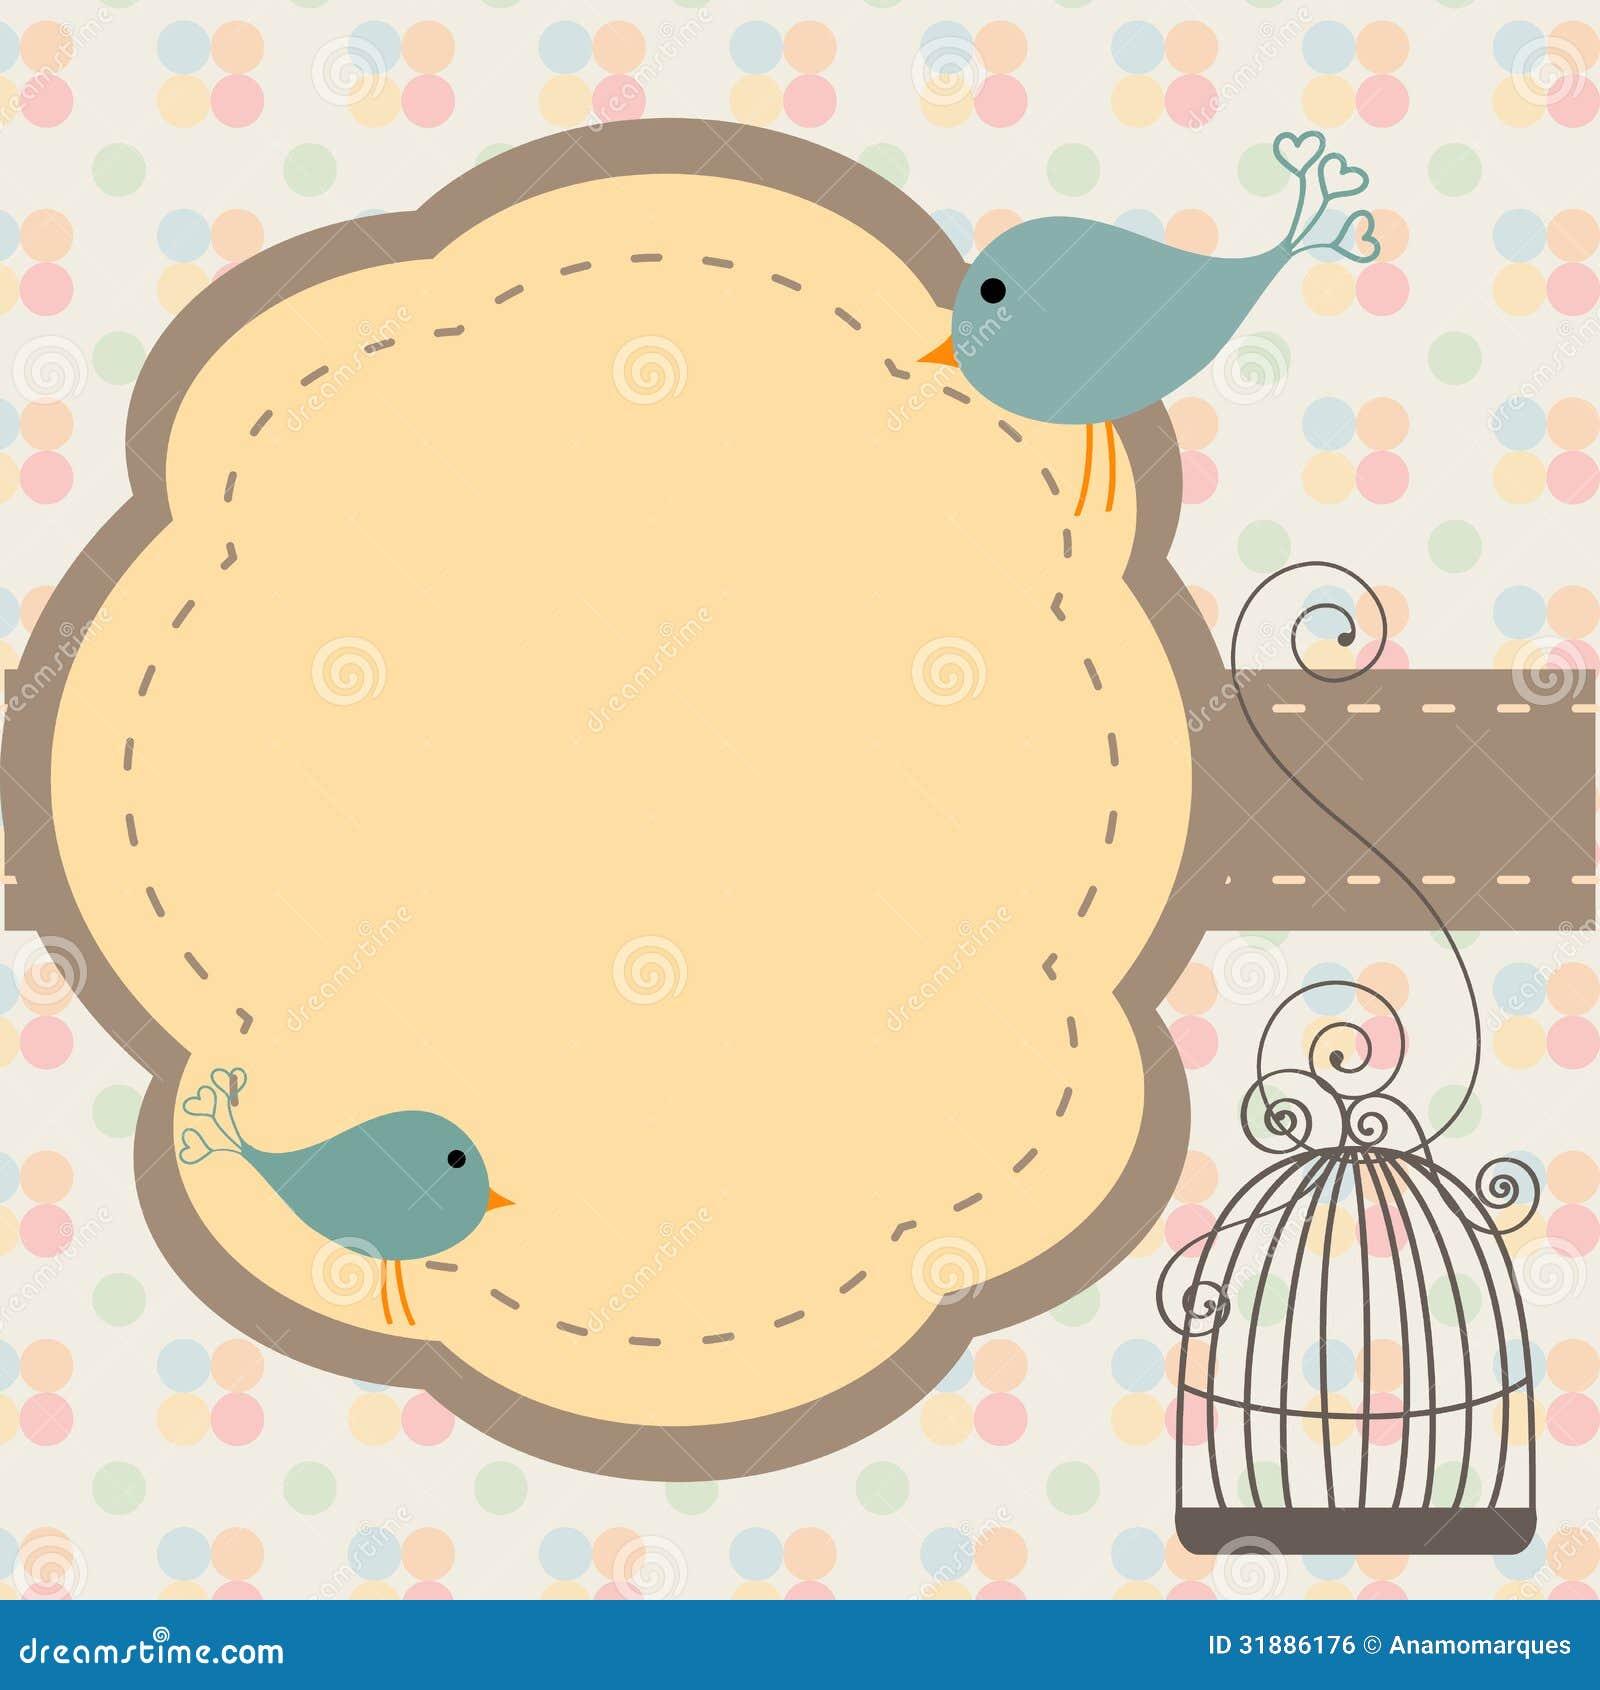 Owls Invitations as nice invitations template